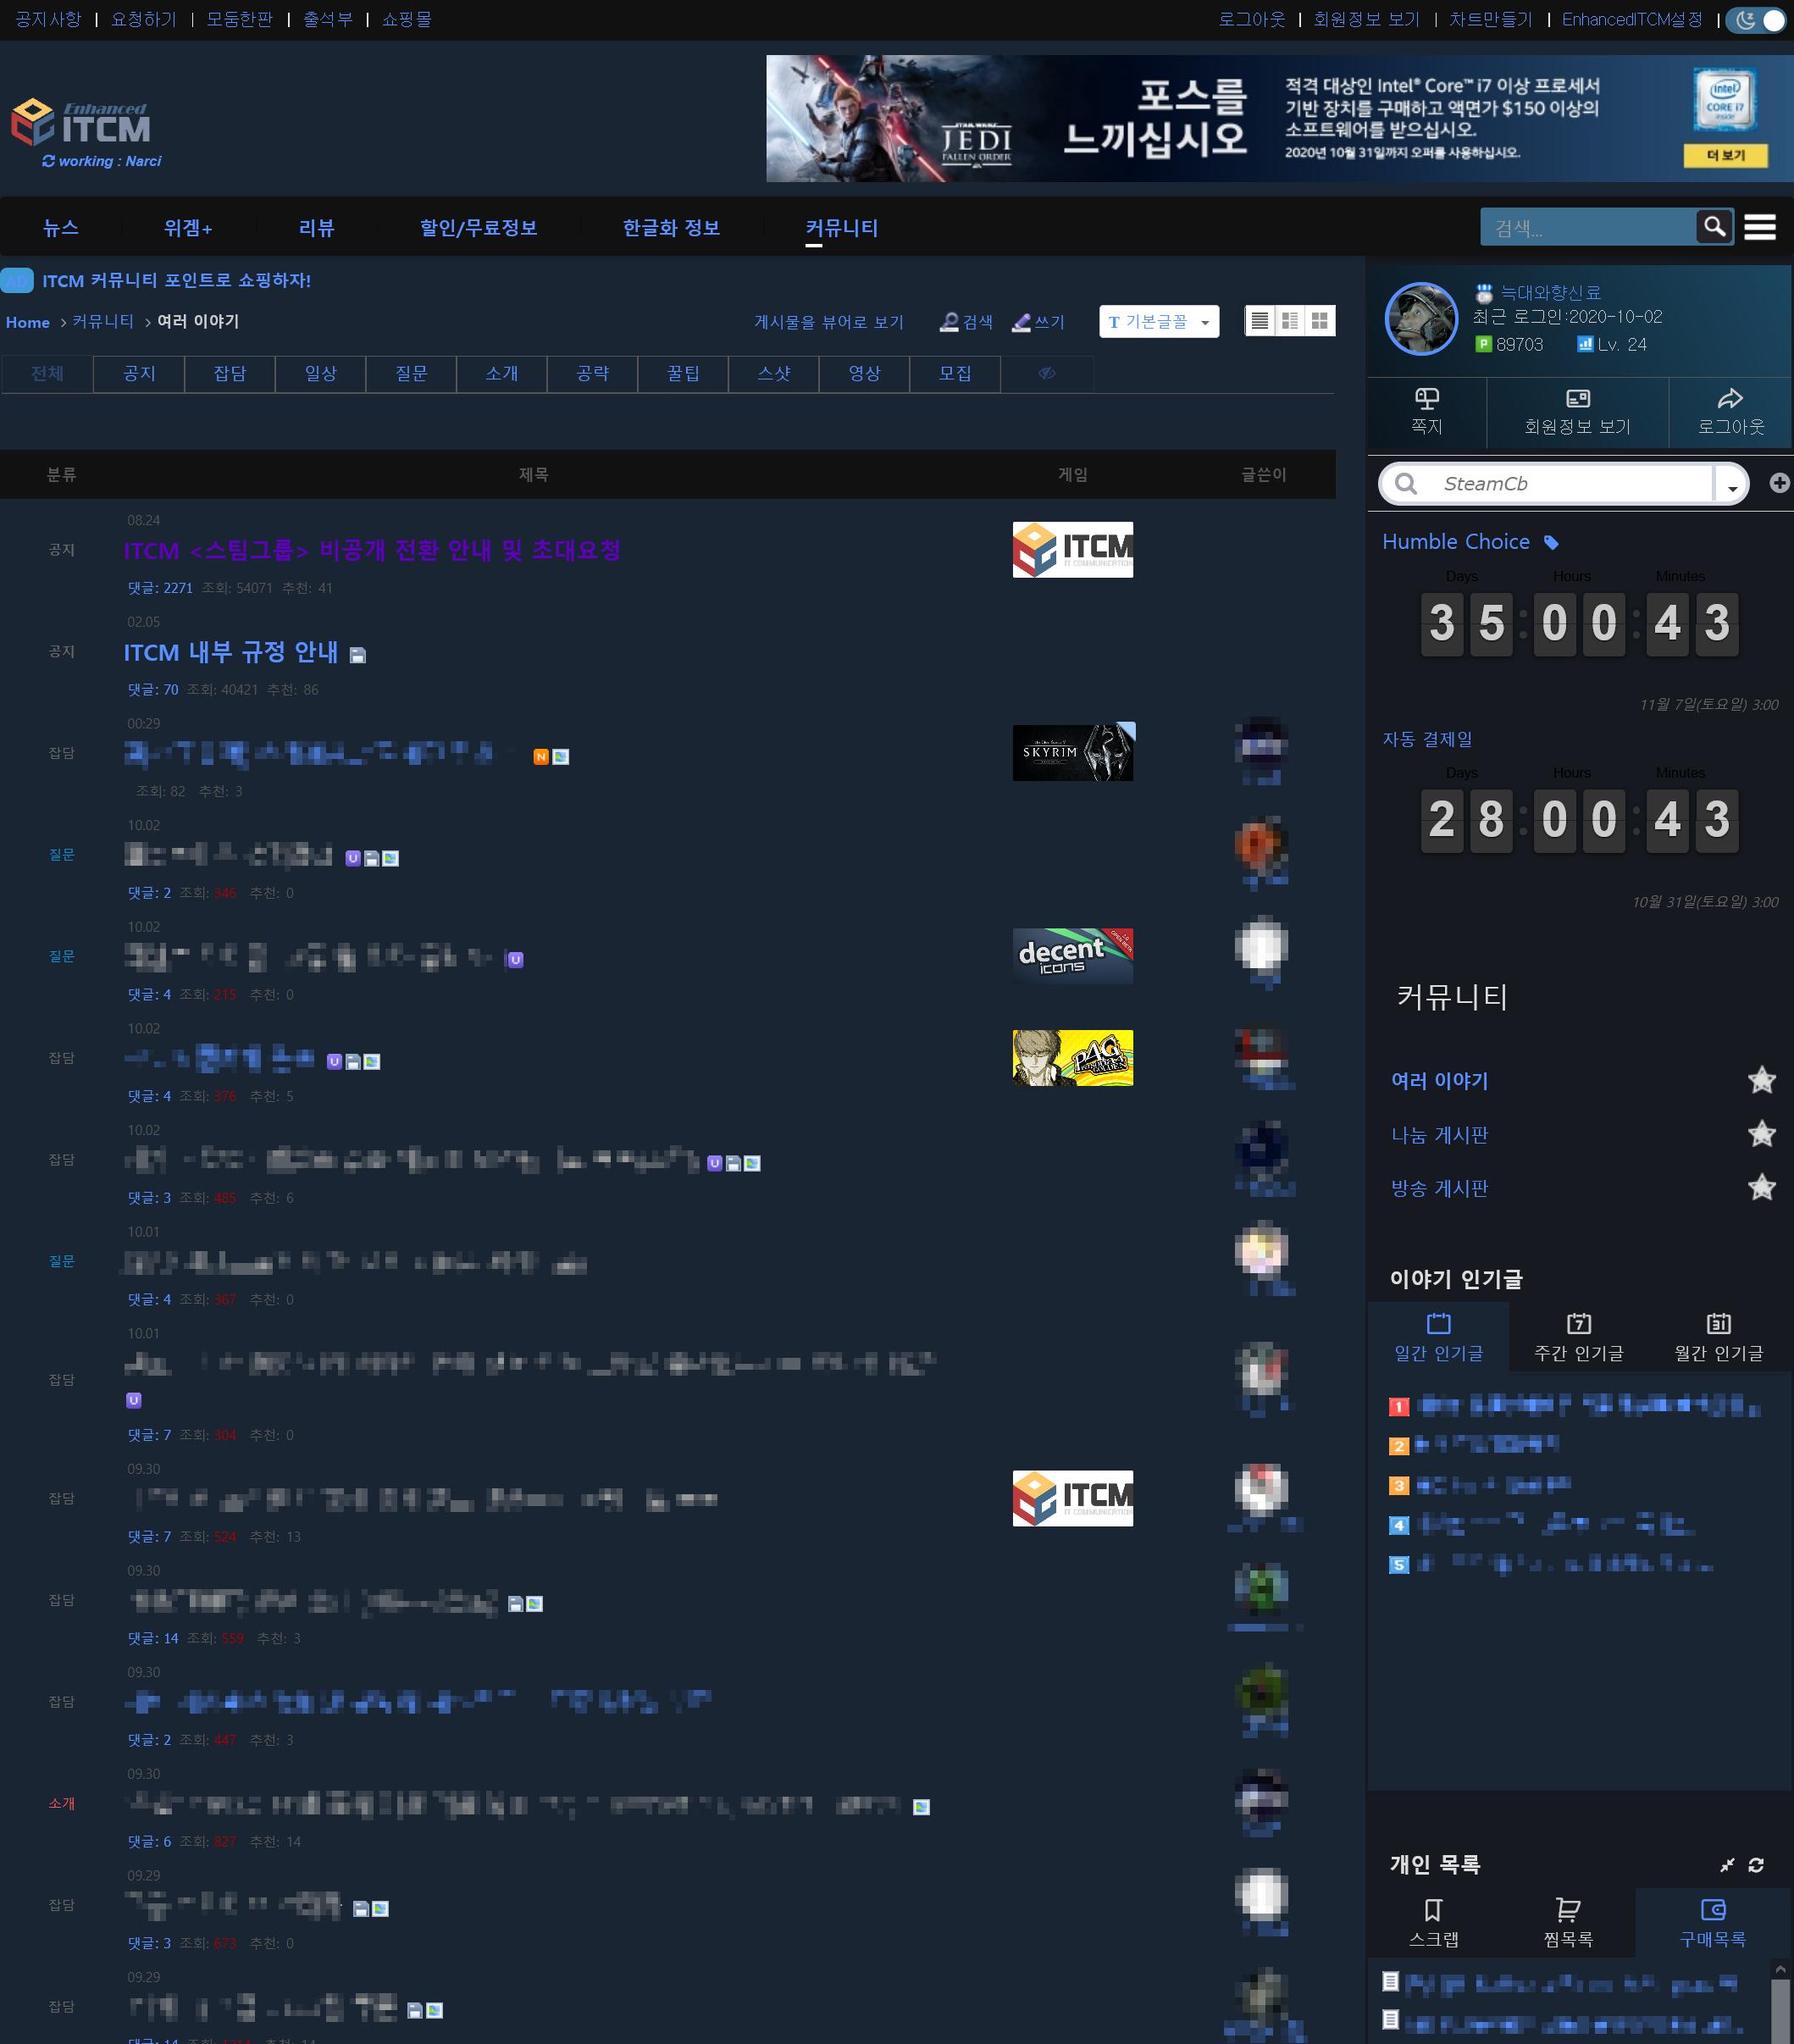 Screenshot_2020-10-03 이야기 - ITCM.png